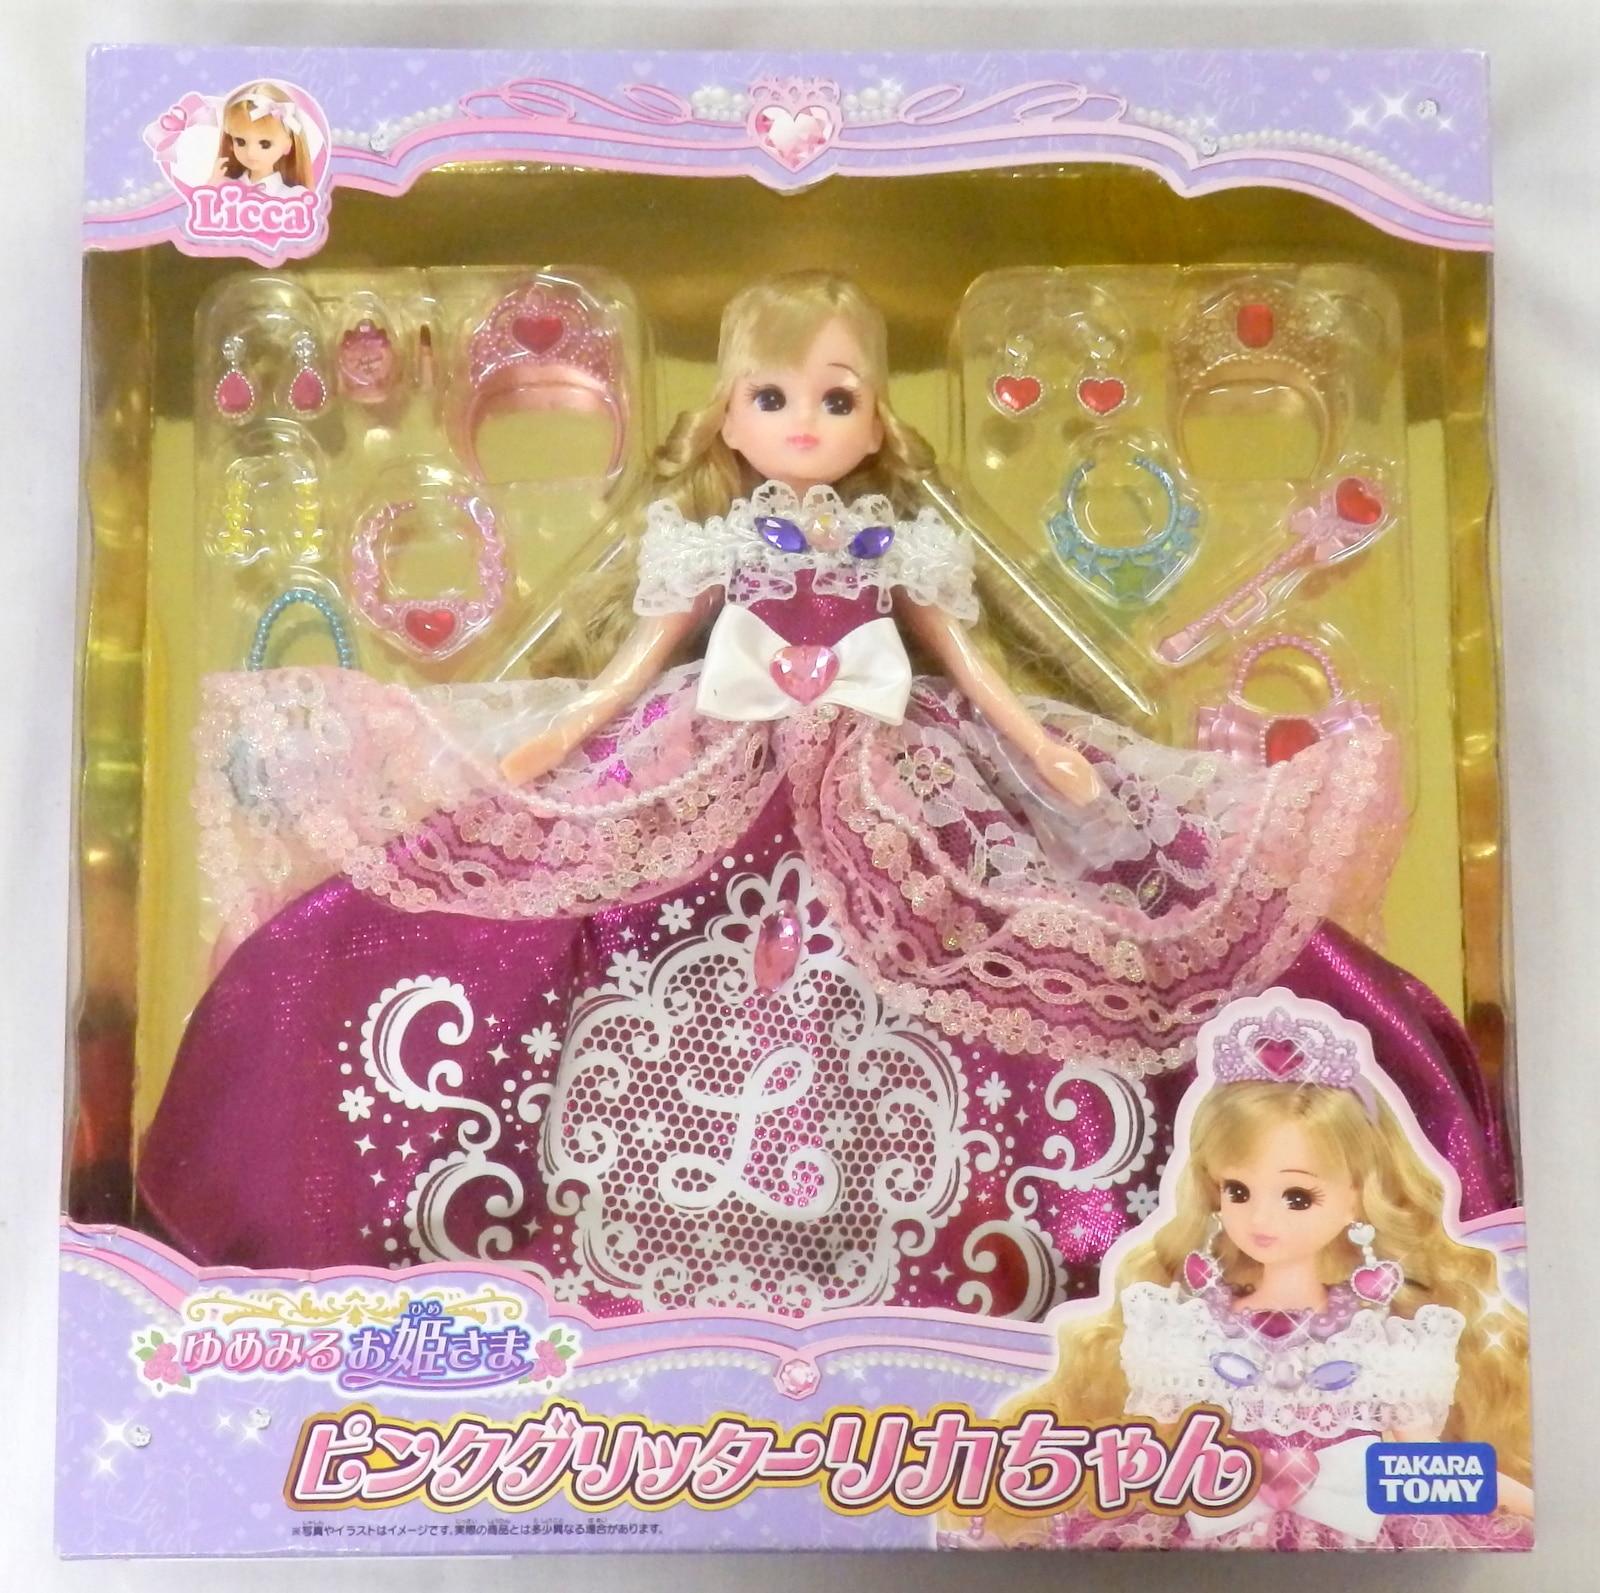 Takara Tomy Licca Dream Princess Pink Glittler Doll